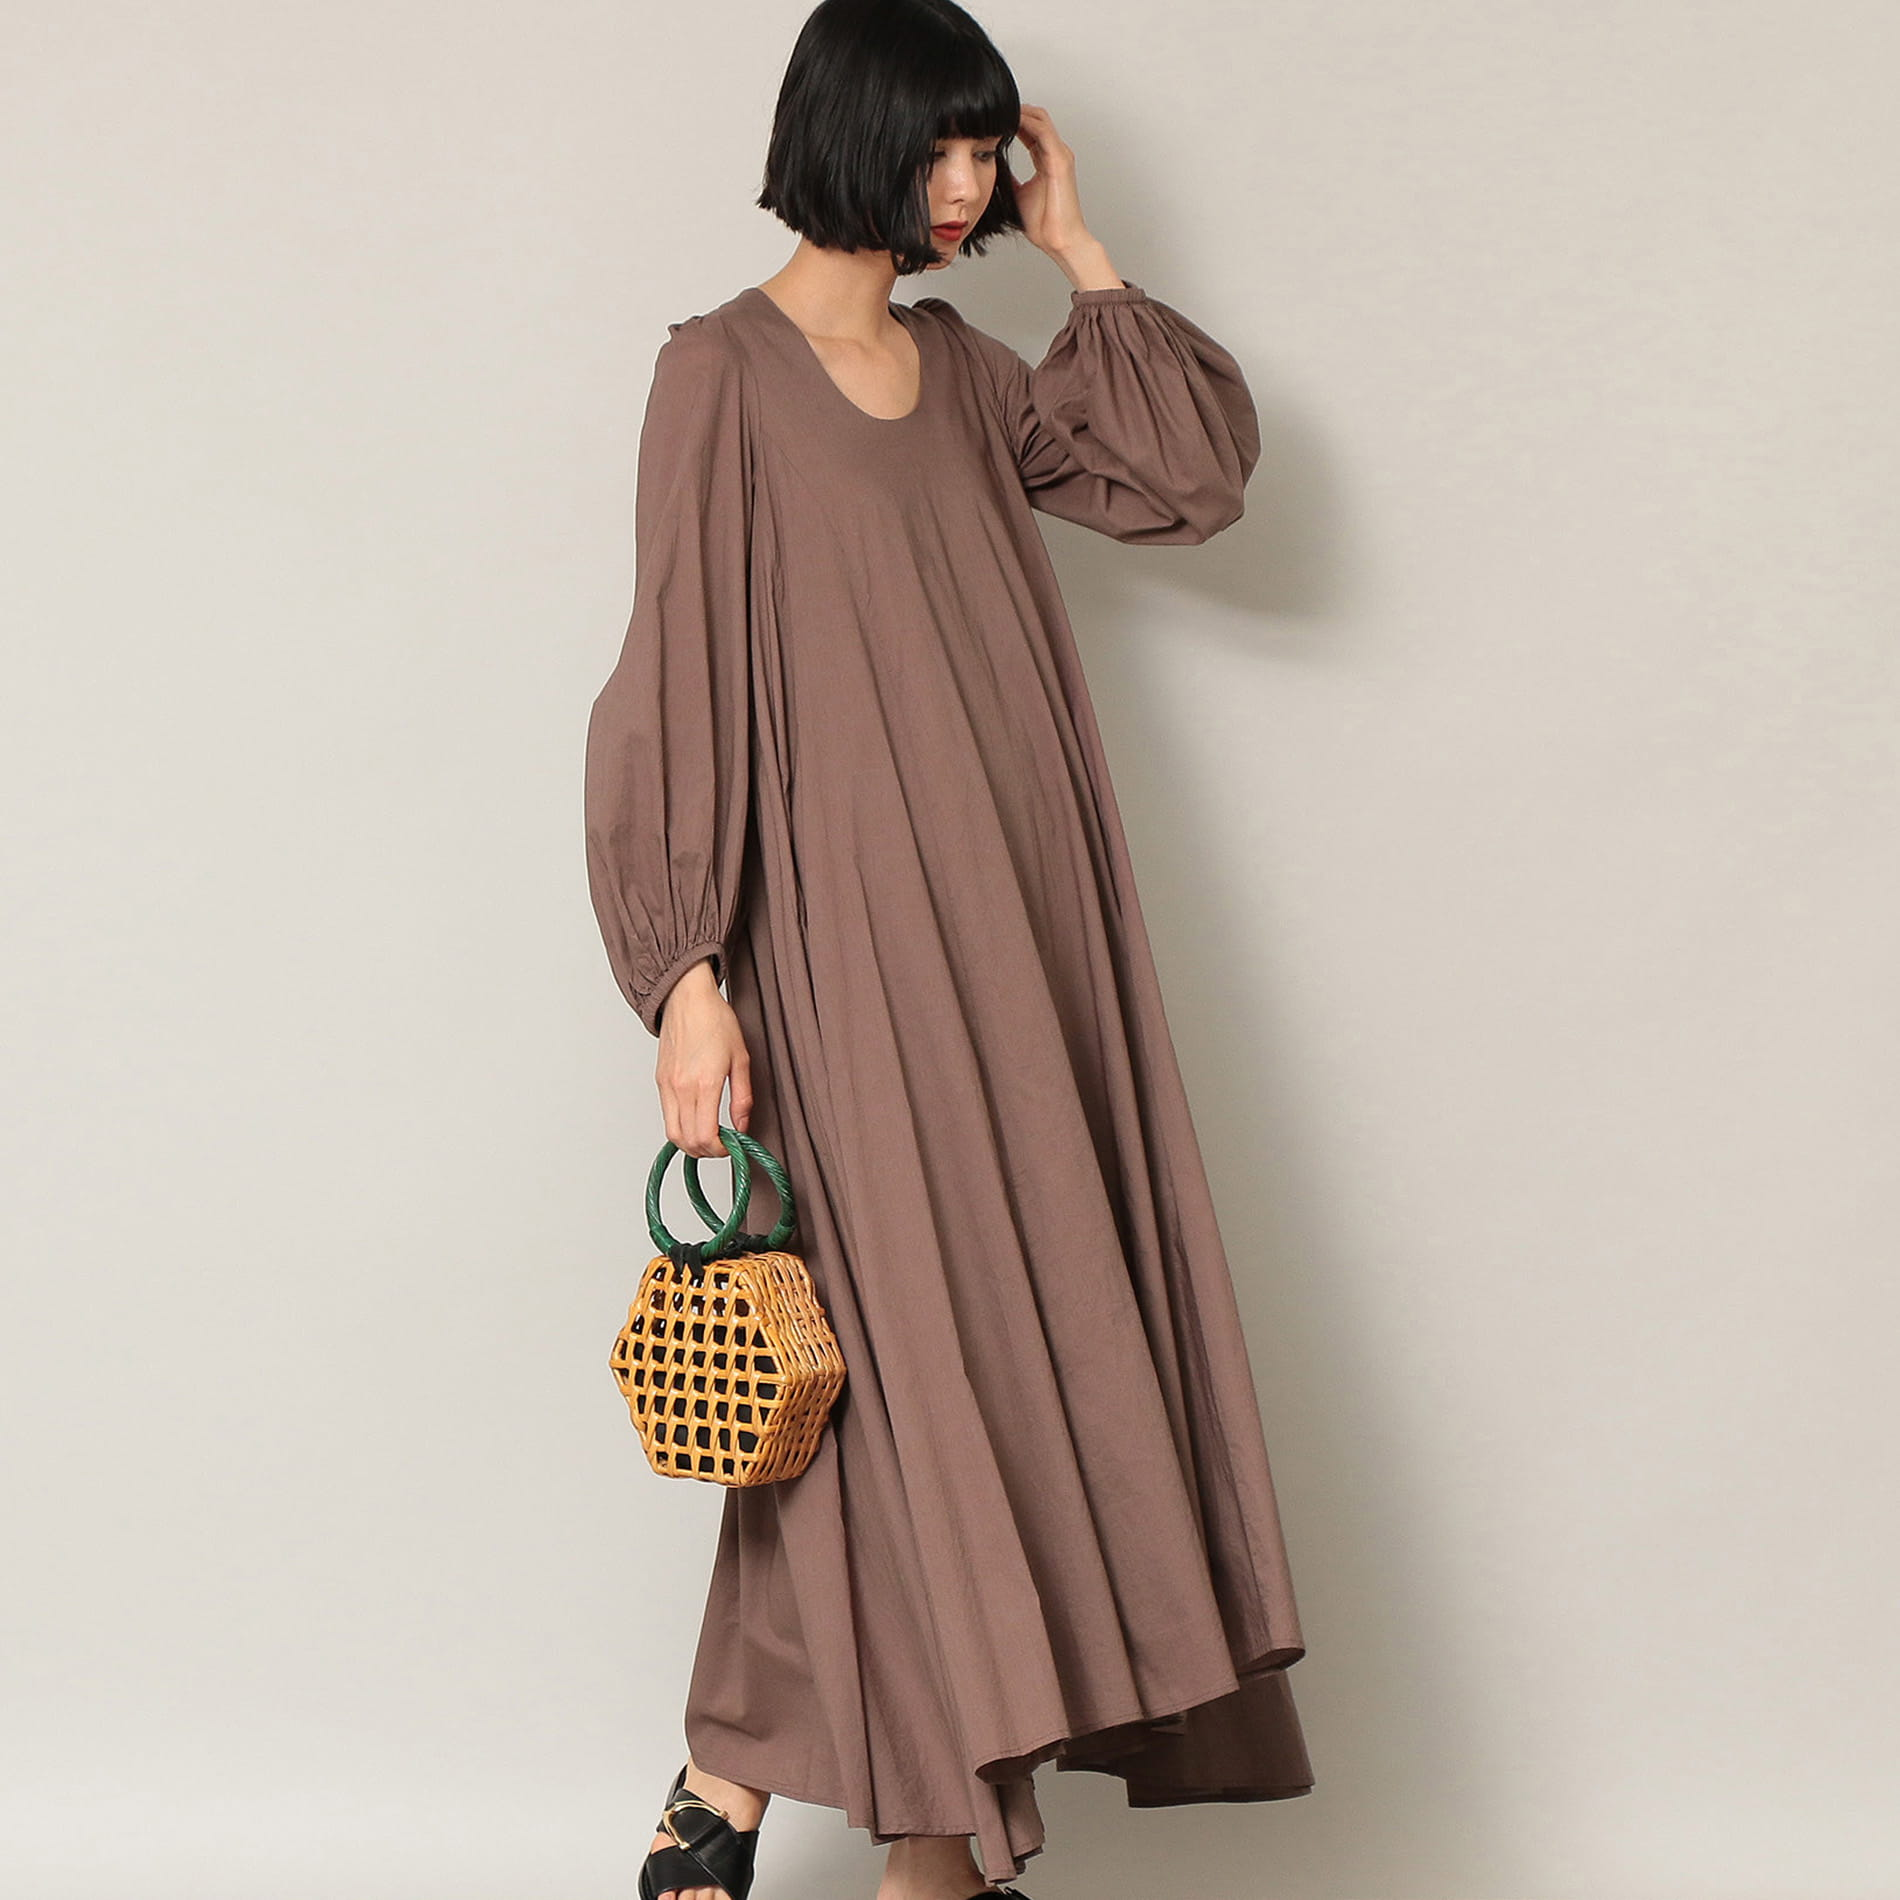 【MARIHA】秋の星影のドレス